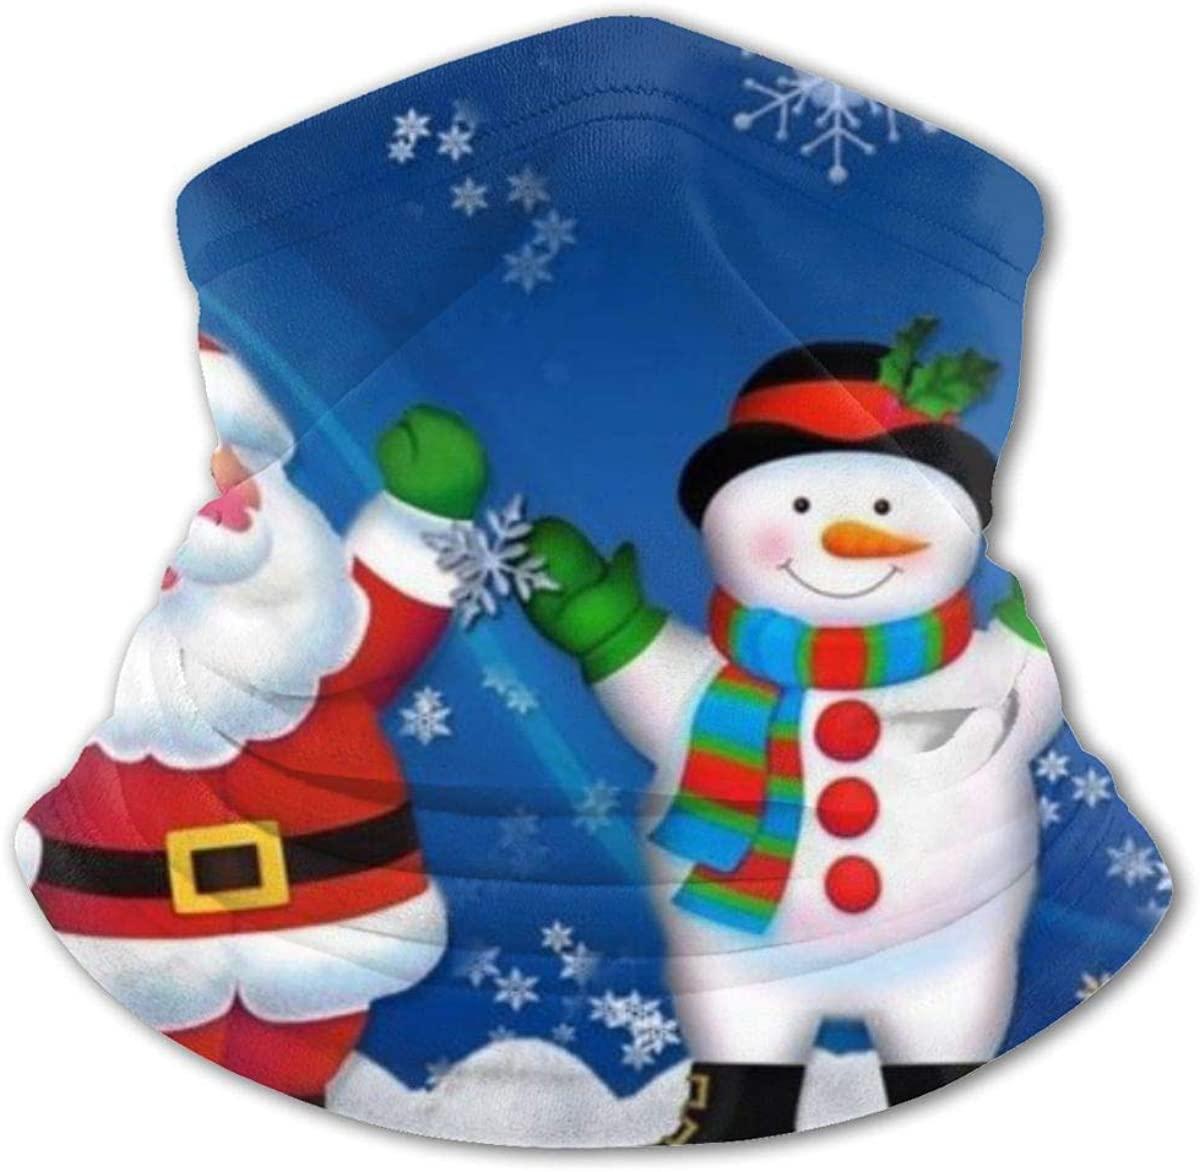 Christmas Santa Snowman Headwear For Girls And Boys, Head Wrap, Neck Gaiter, Headband, Tenn Fishing Mask, Magic Scarf, Tube Mask, Face Bandana Mask For Camping Running Cycling